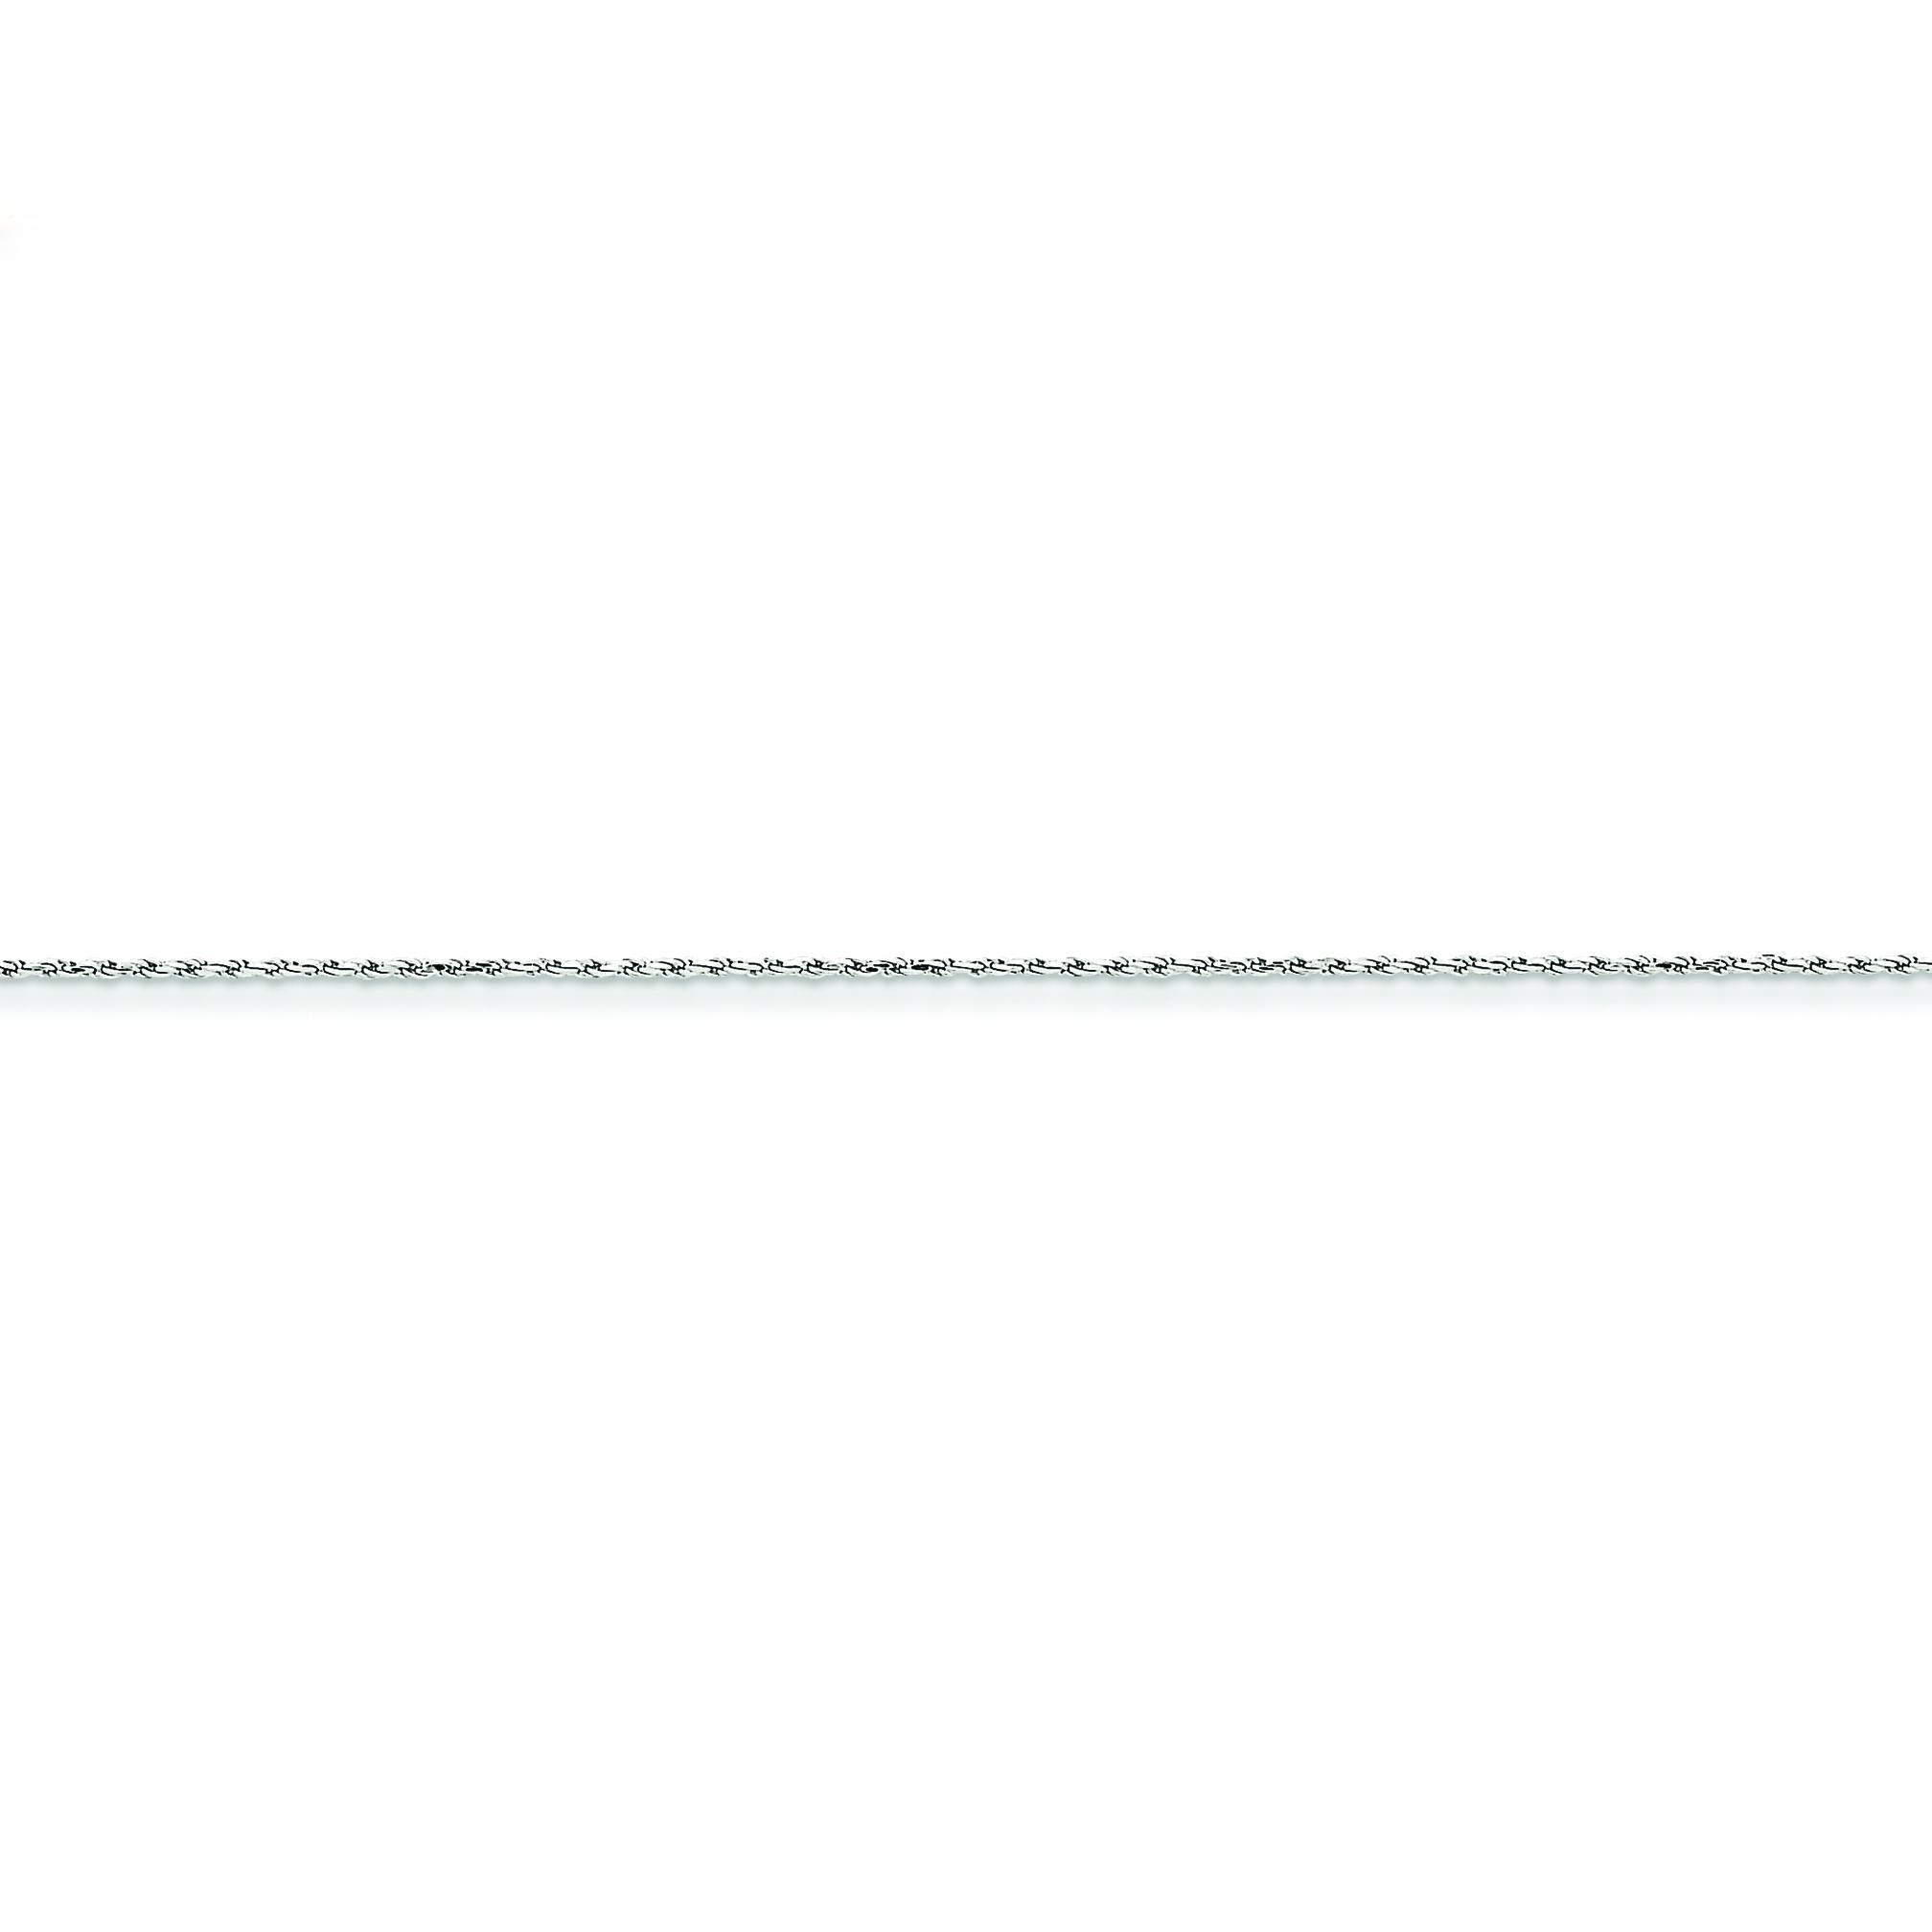 14k White Gold 6 inch 1.00 mm Machine Made Diamond-cut Rope Chain Bracelet